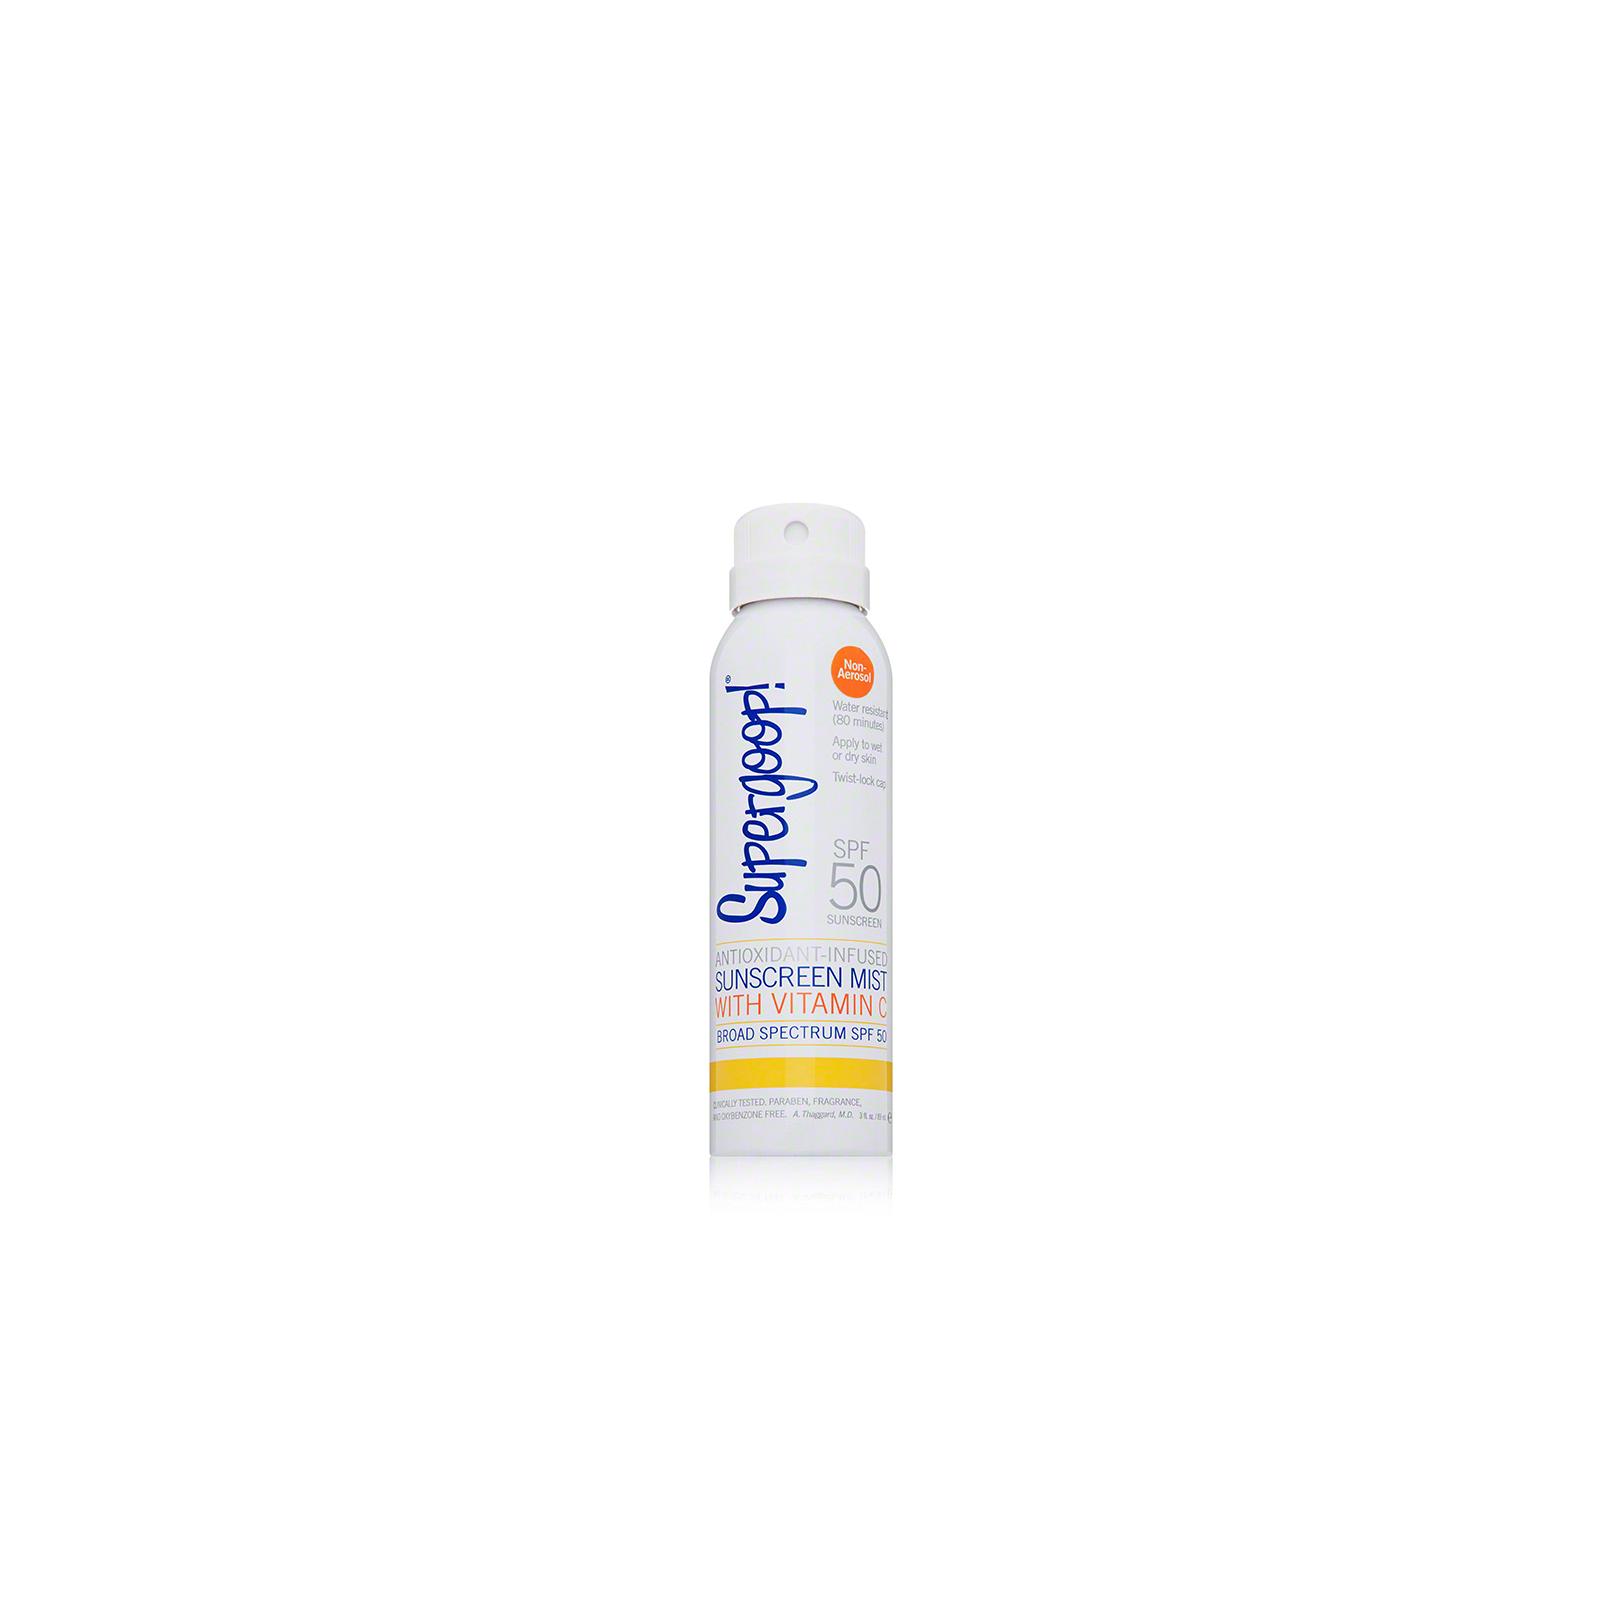 Supergoop Antioxidant-Infused Sunscreen Mist with Vitamin C